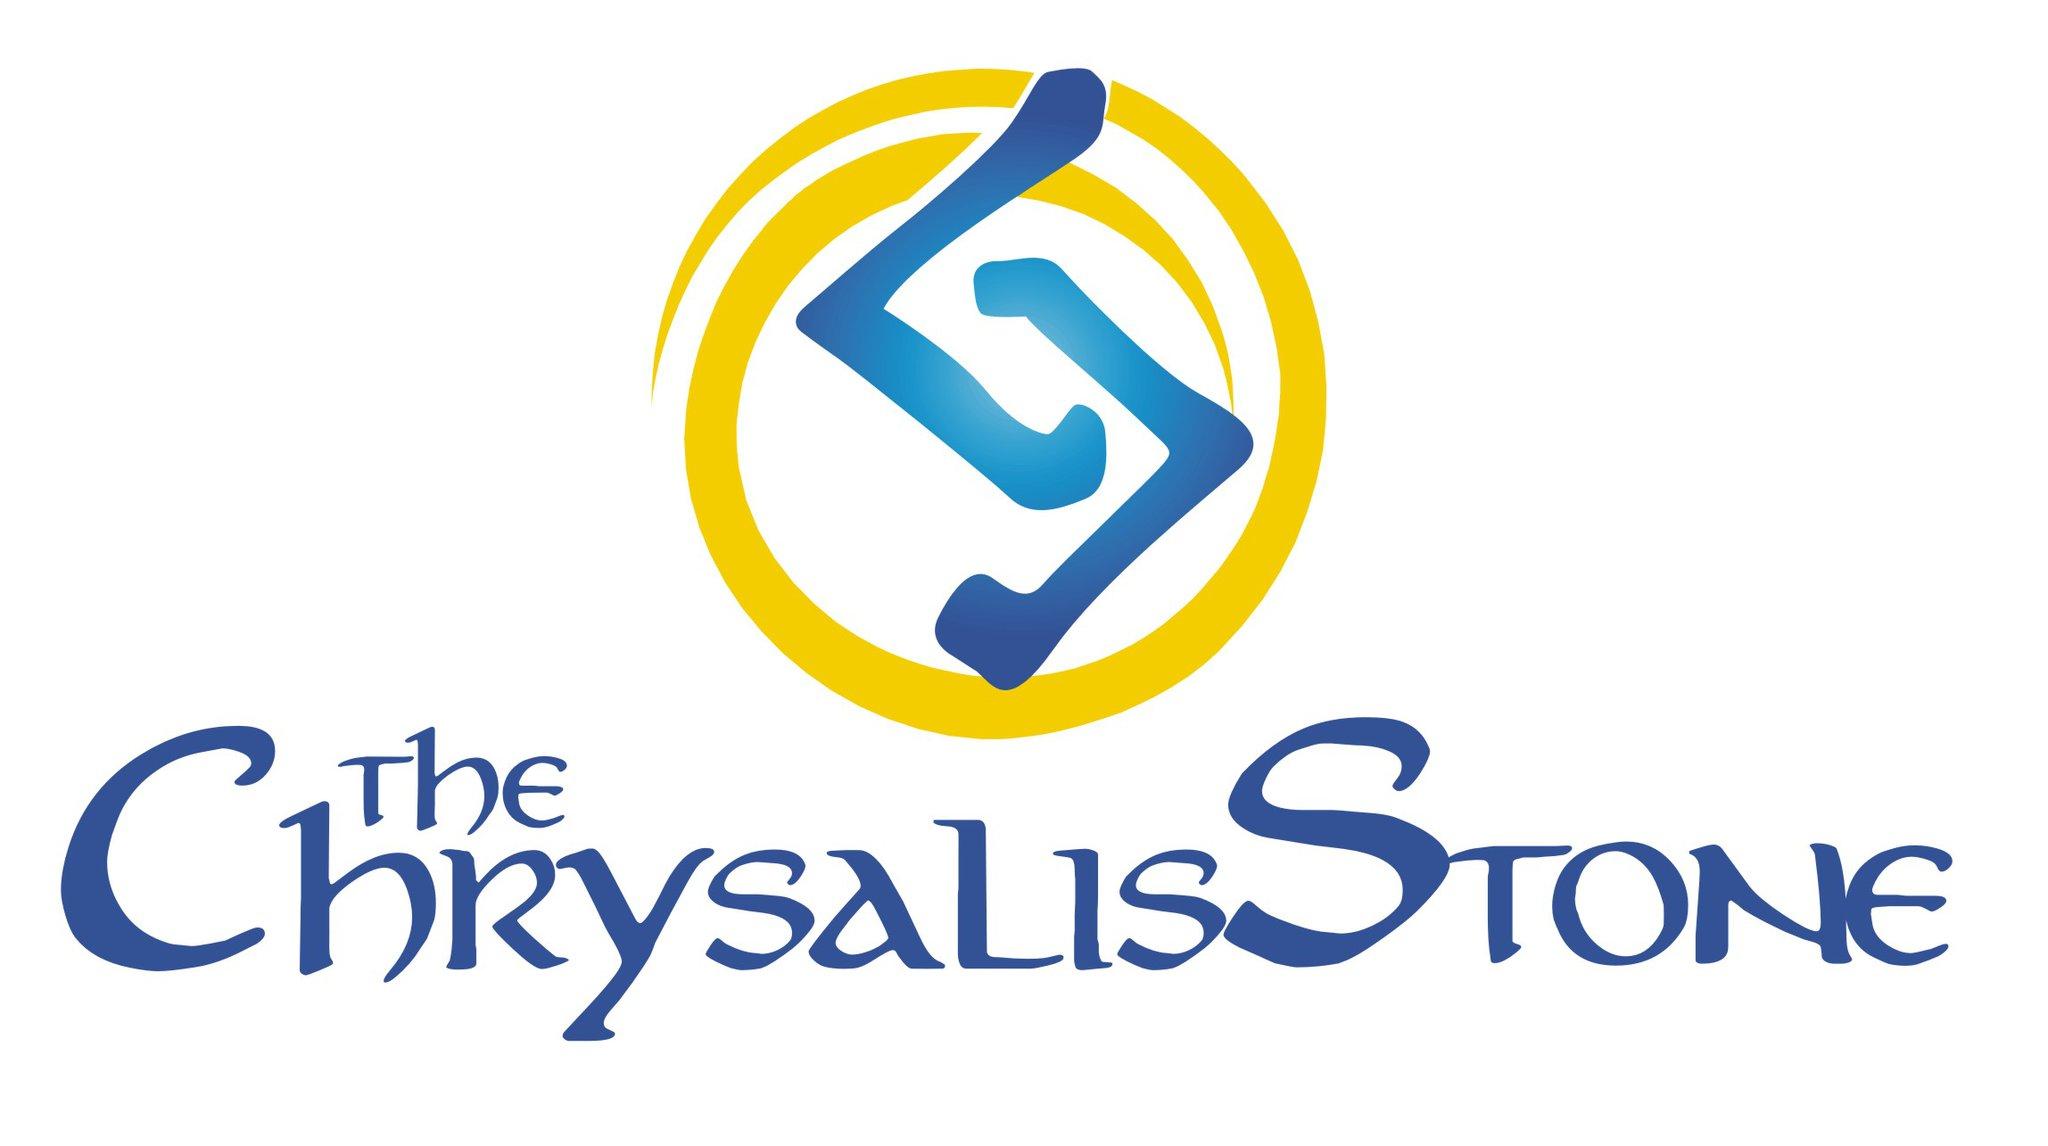 the chrysalis stone coupon code